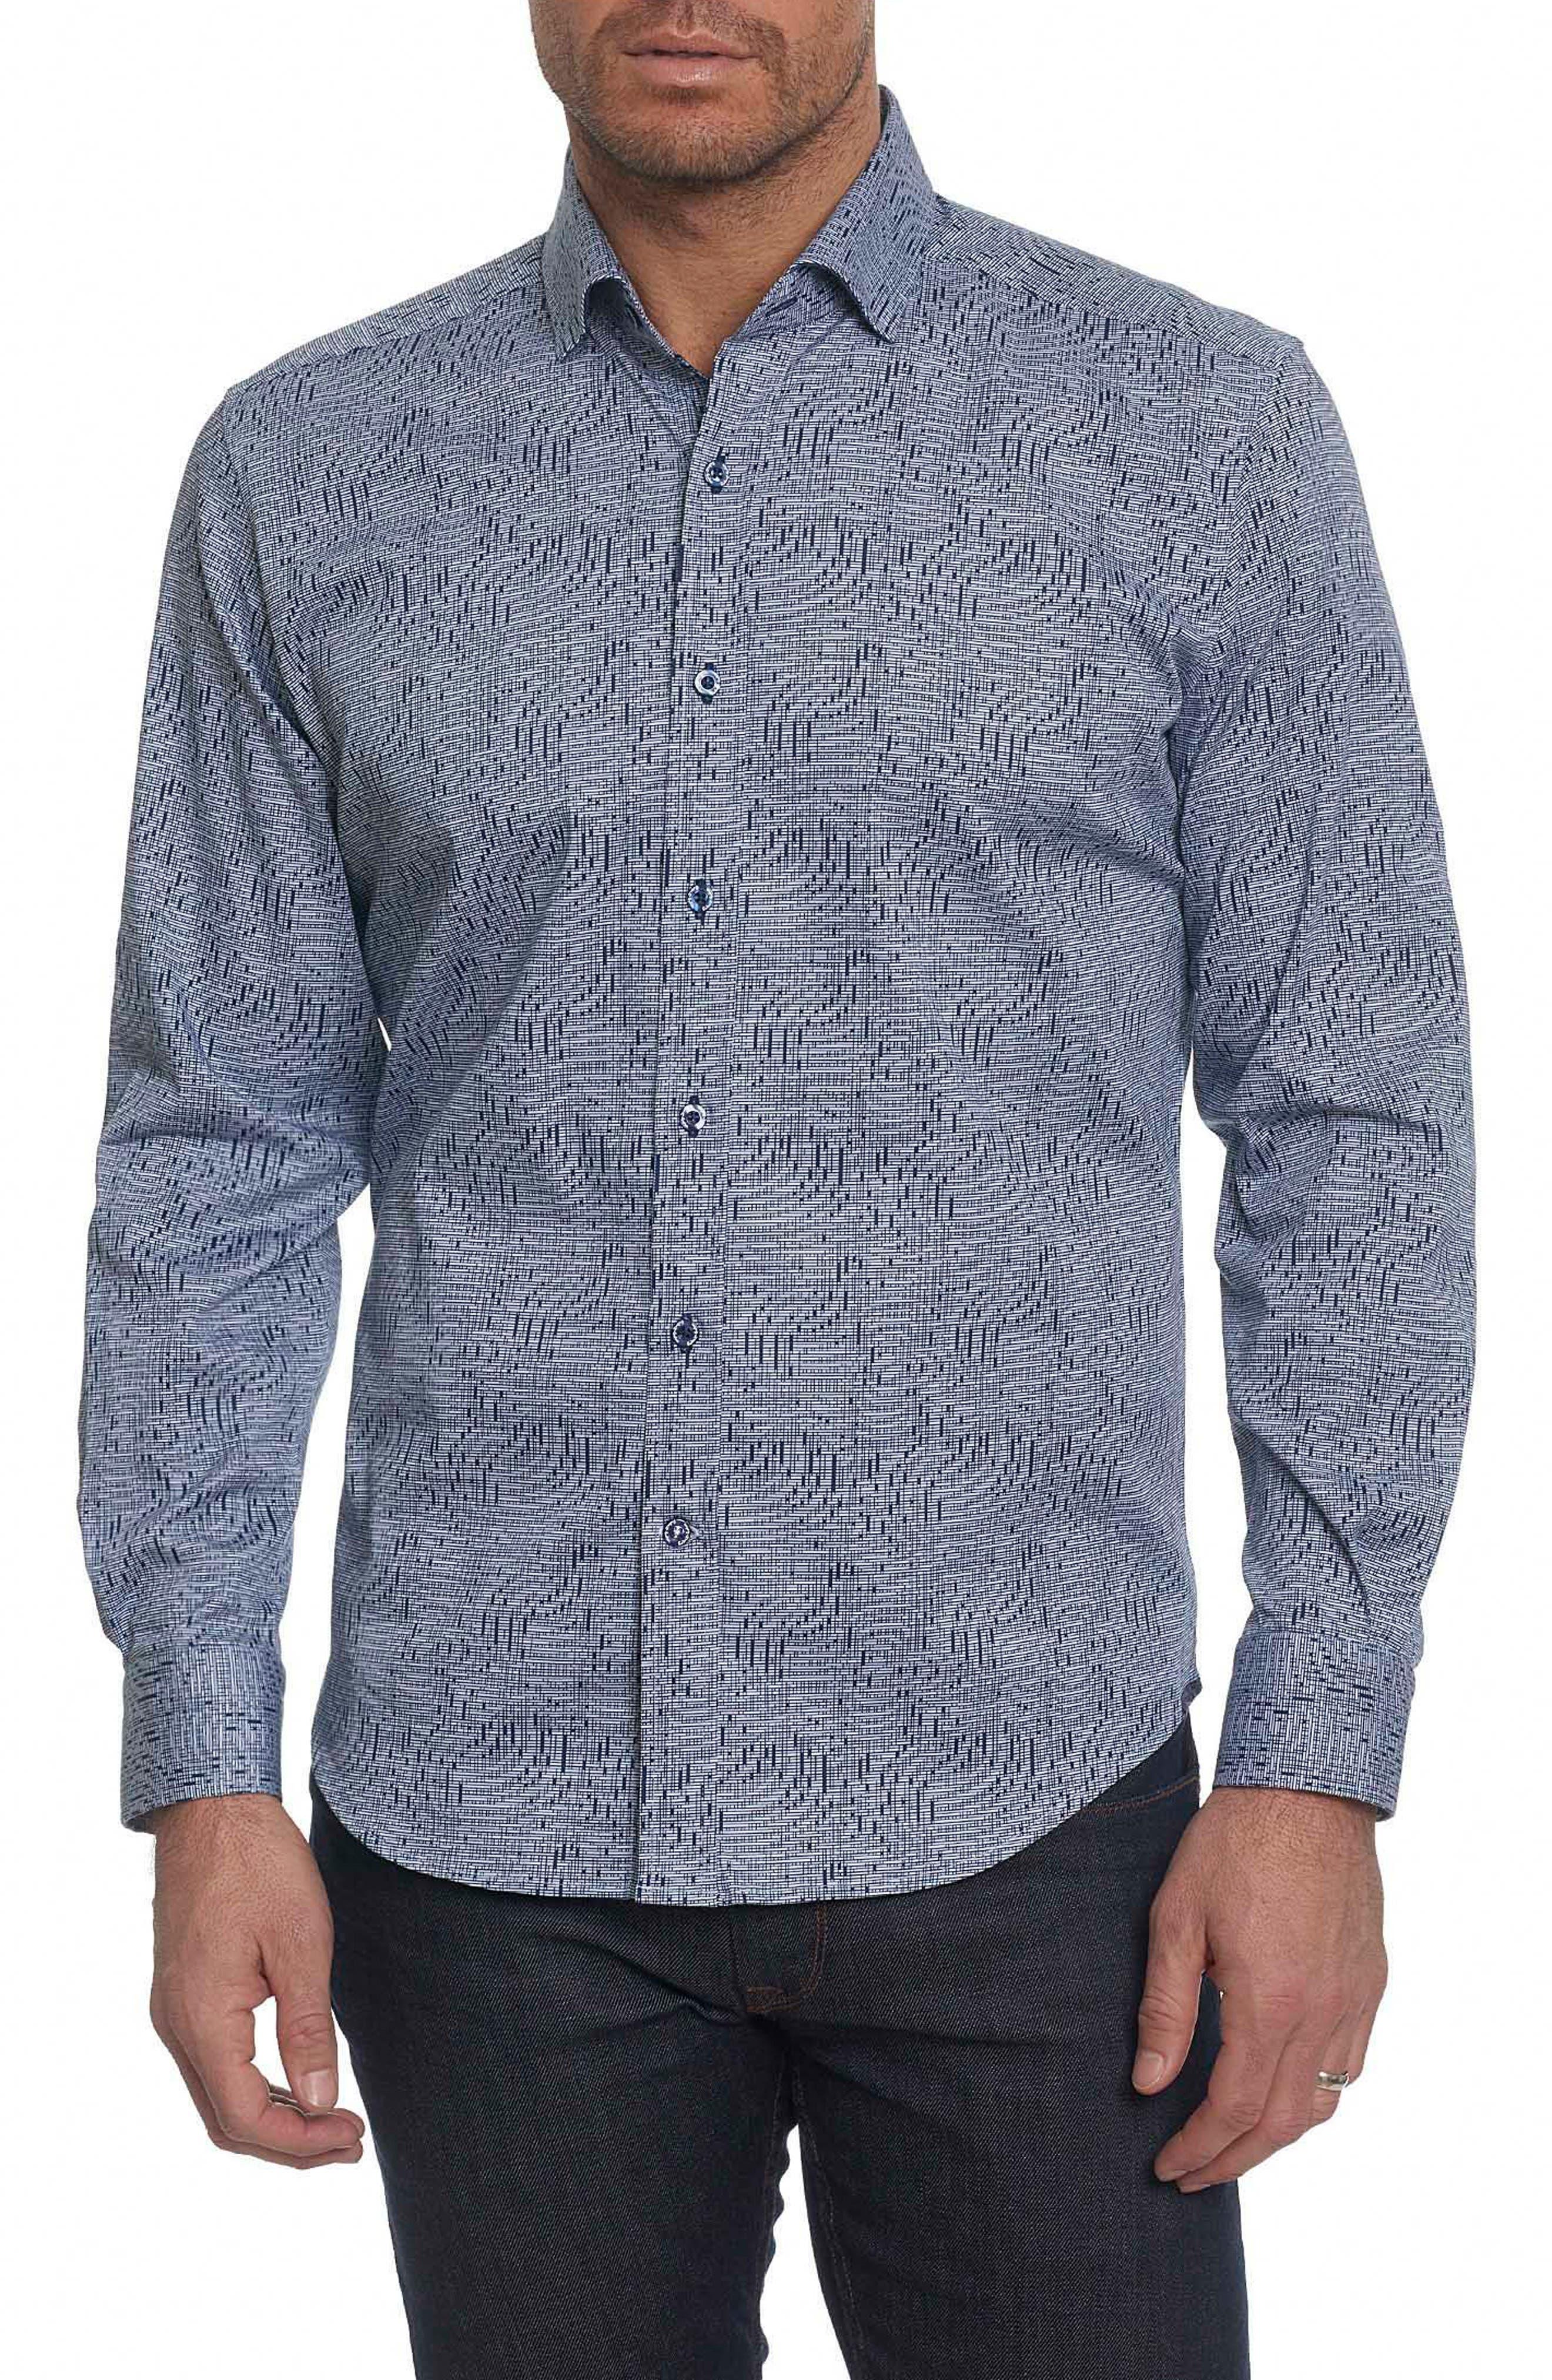 Main Image - Robert Graham Donovan Tailored Fit Sport Shirt